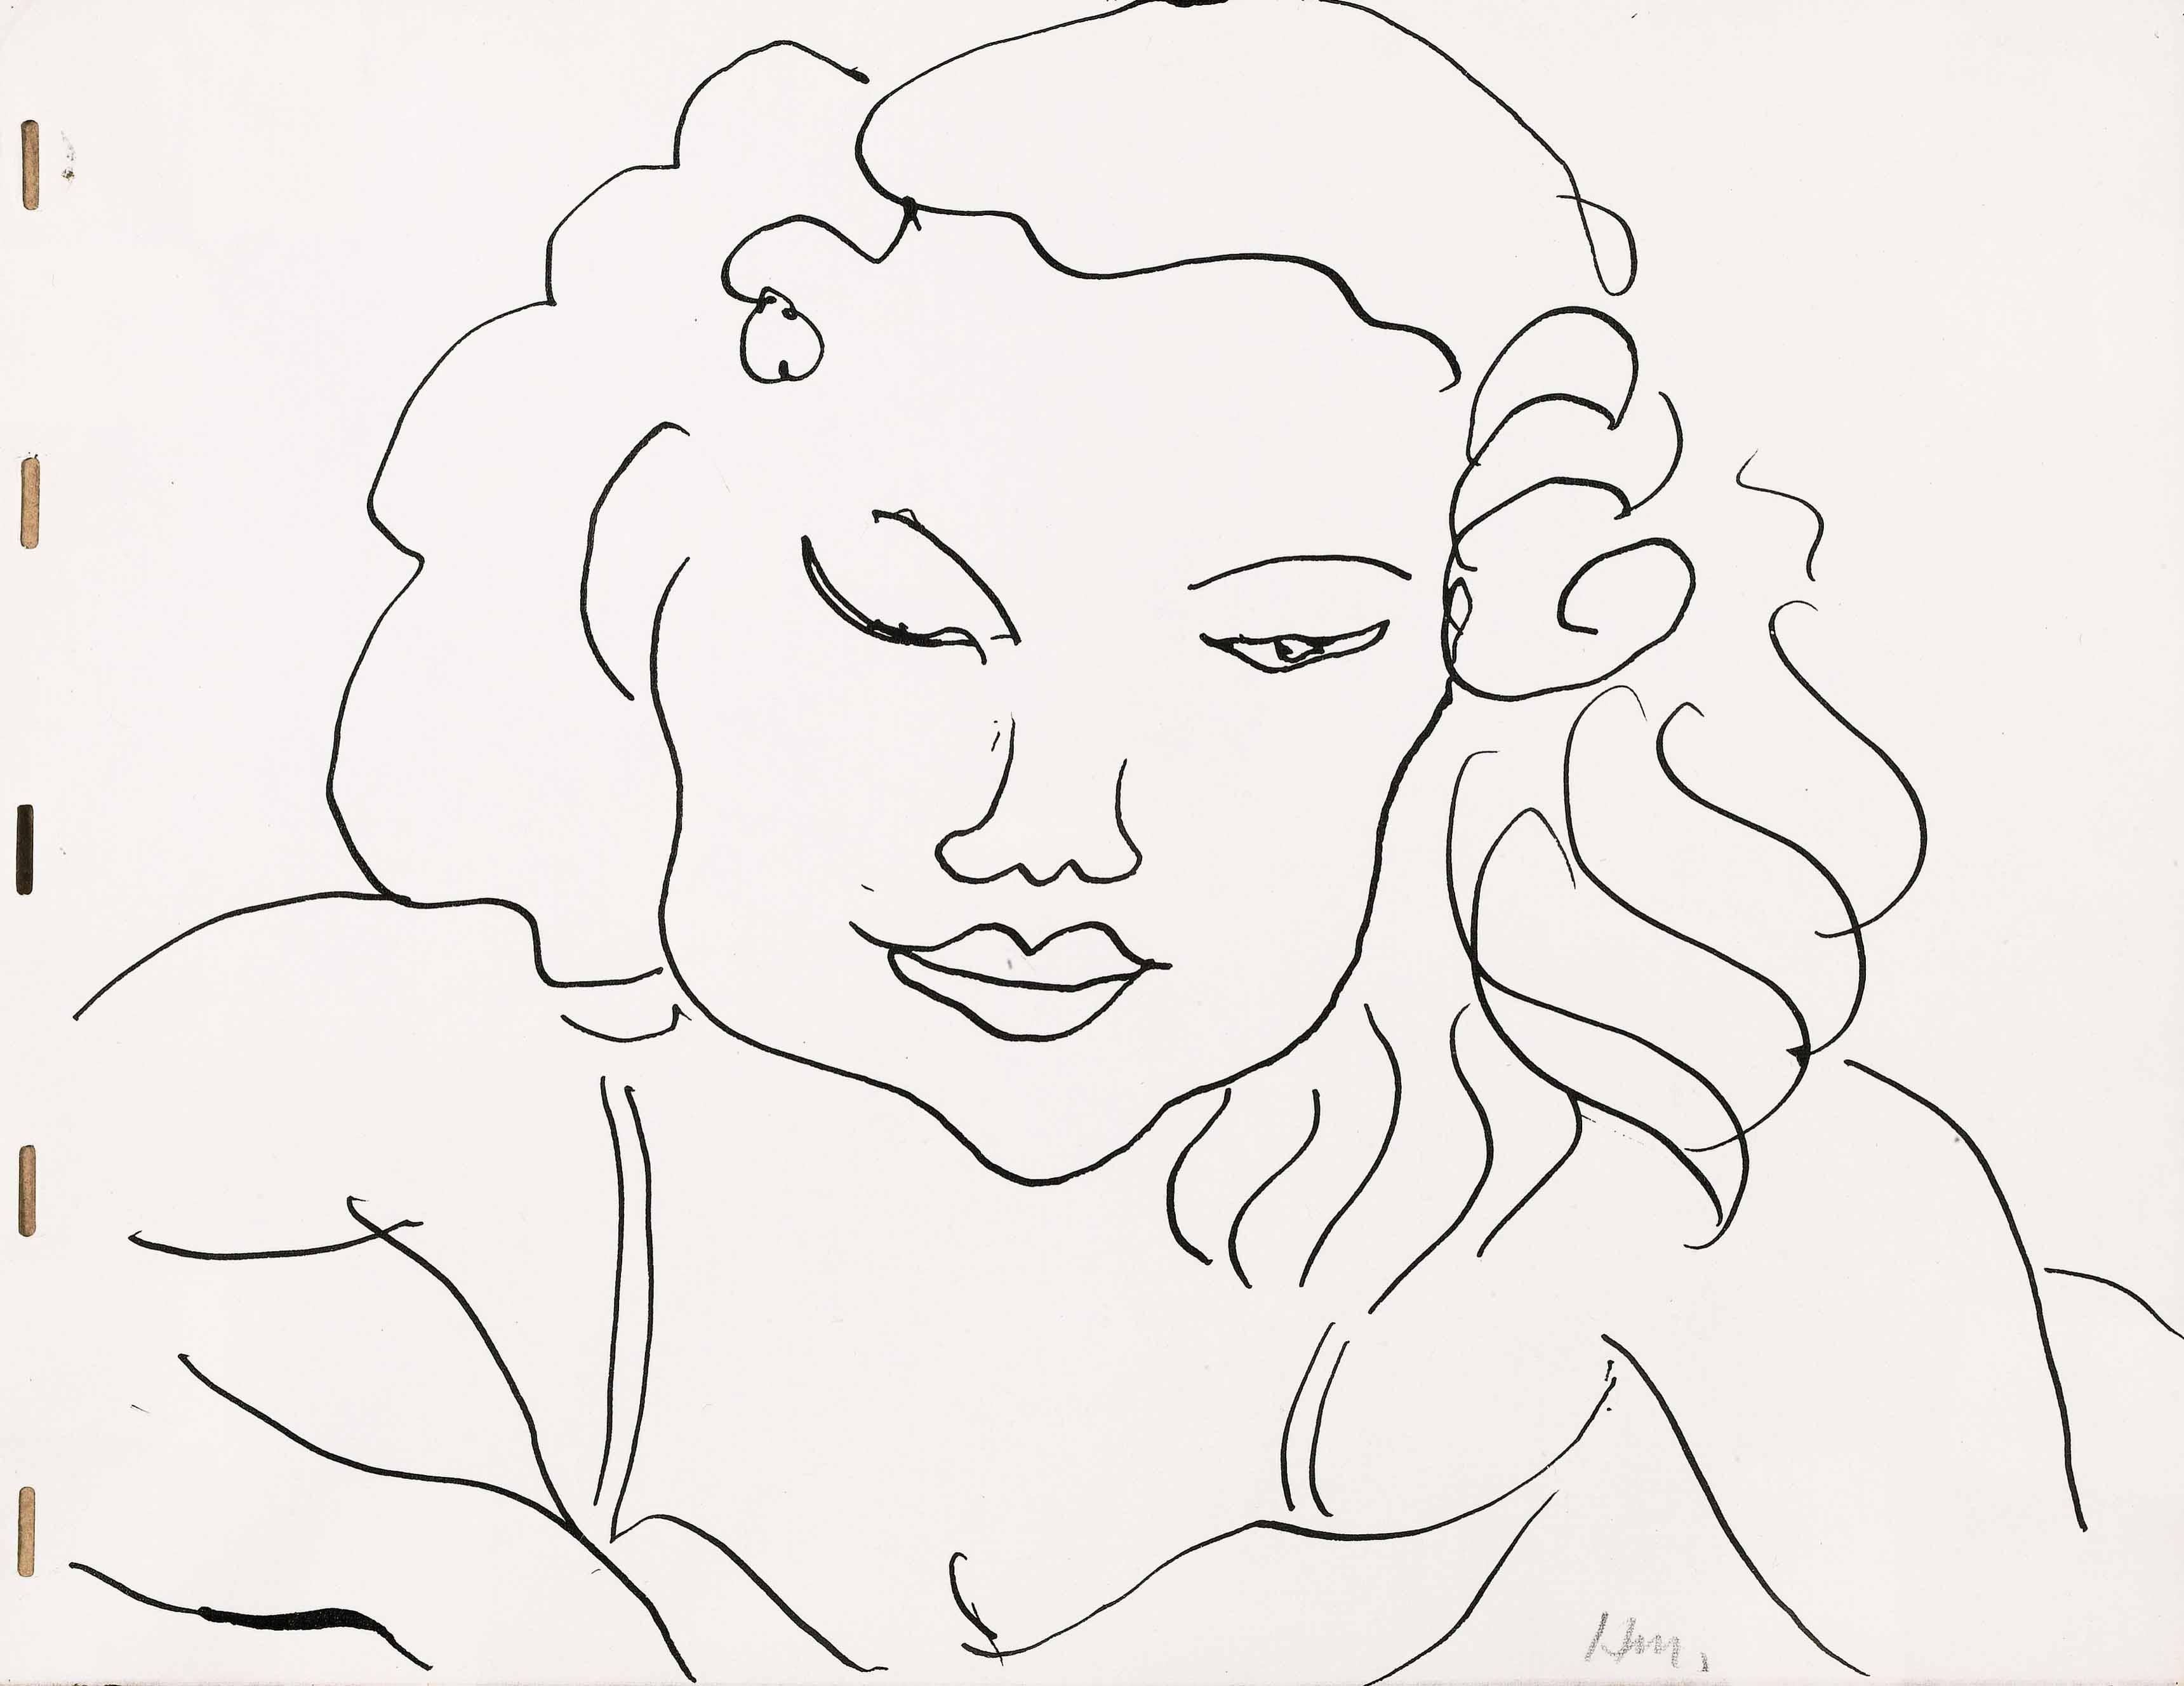 HENRI MATISSE PORTRAIT OF A WOMAN OR THE WINK Estimate : 40,000 - 60,000 EUR